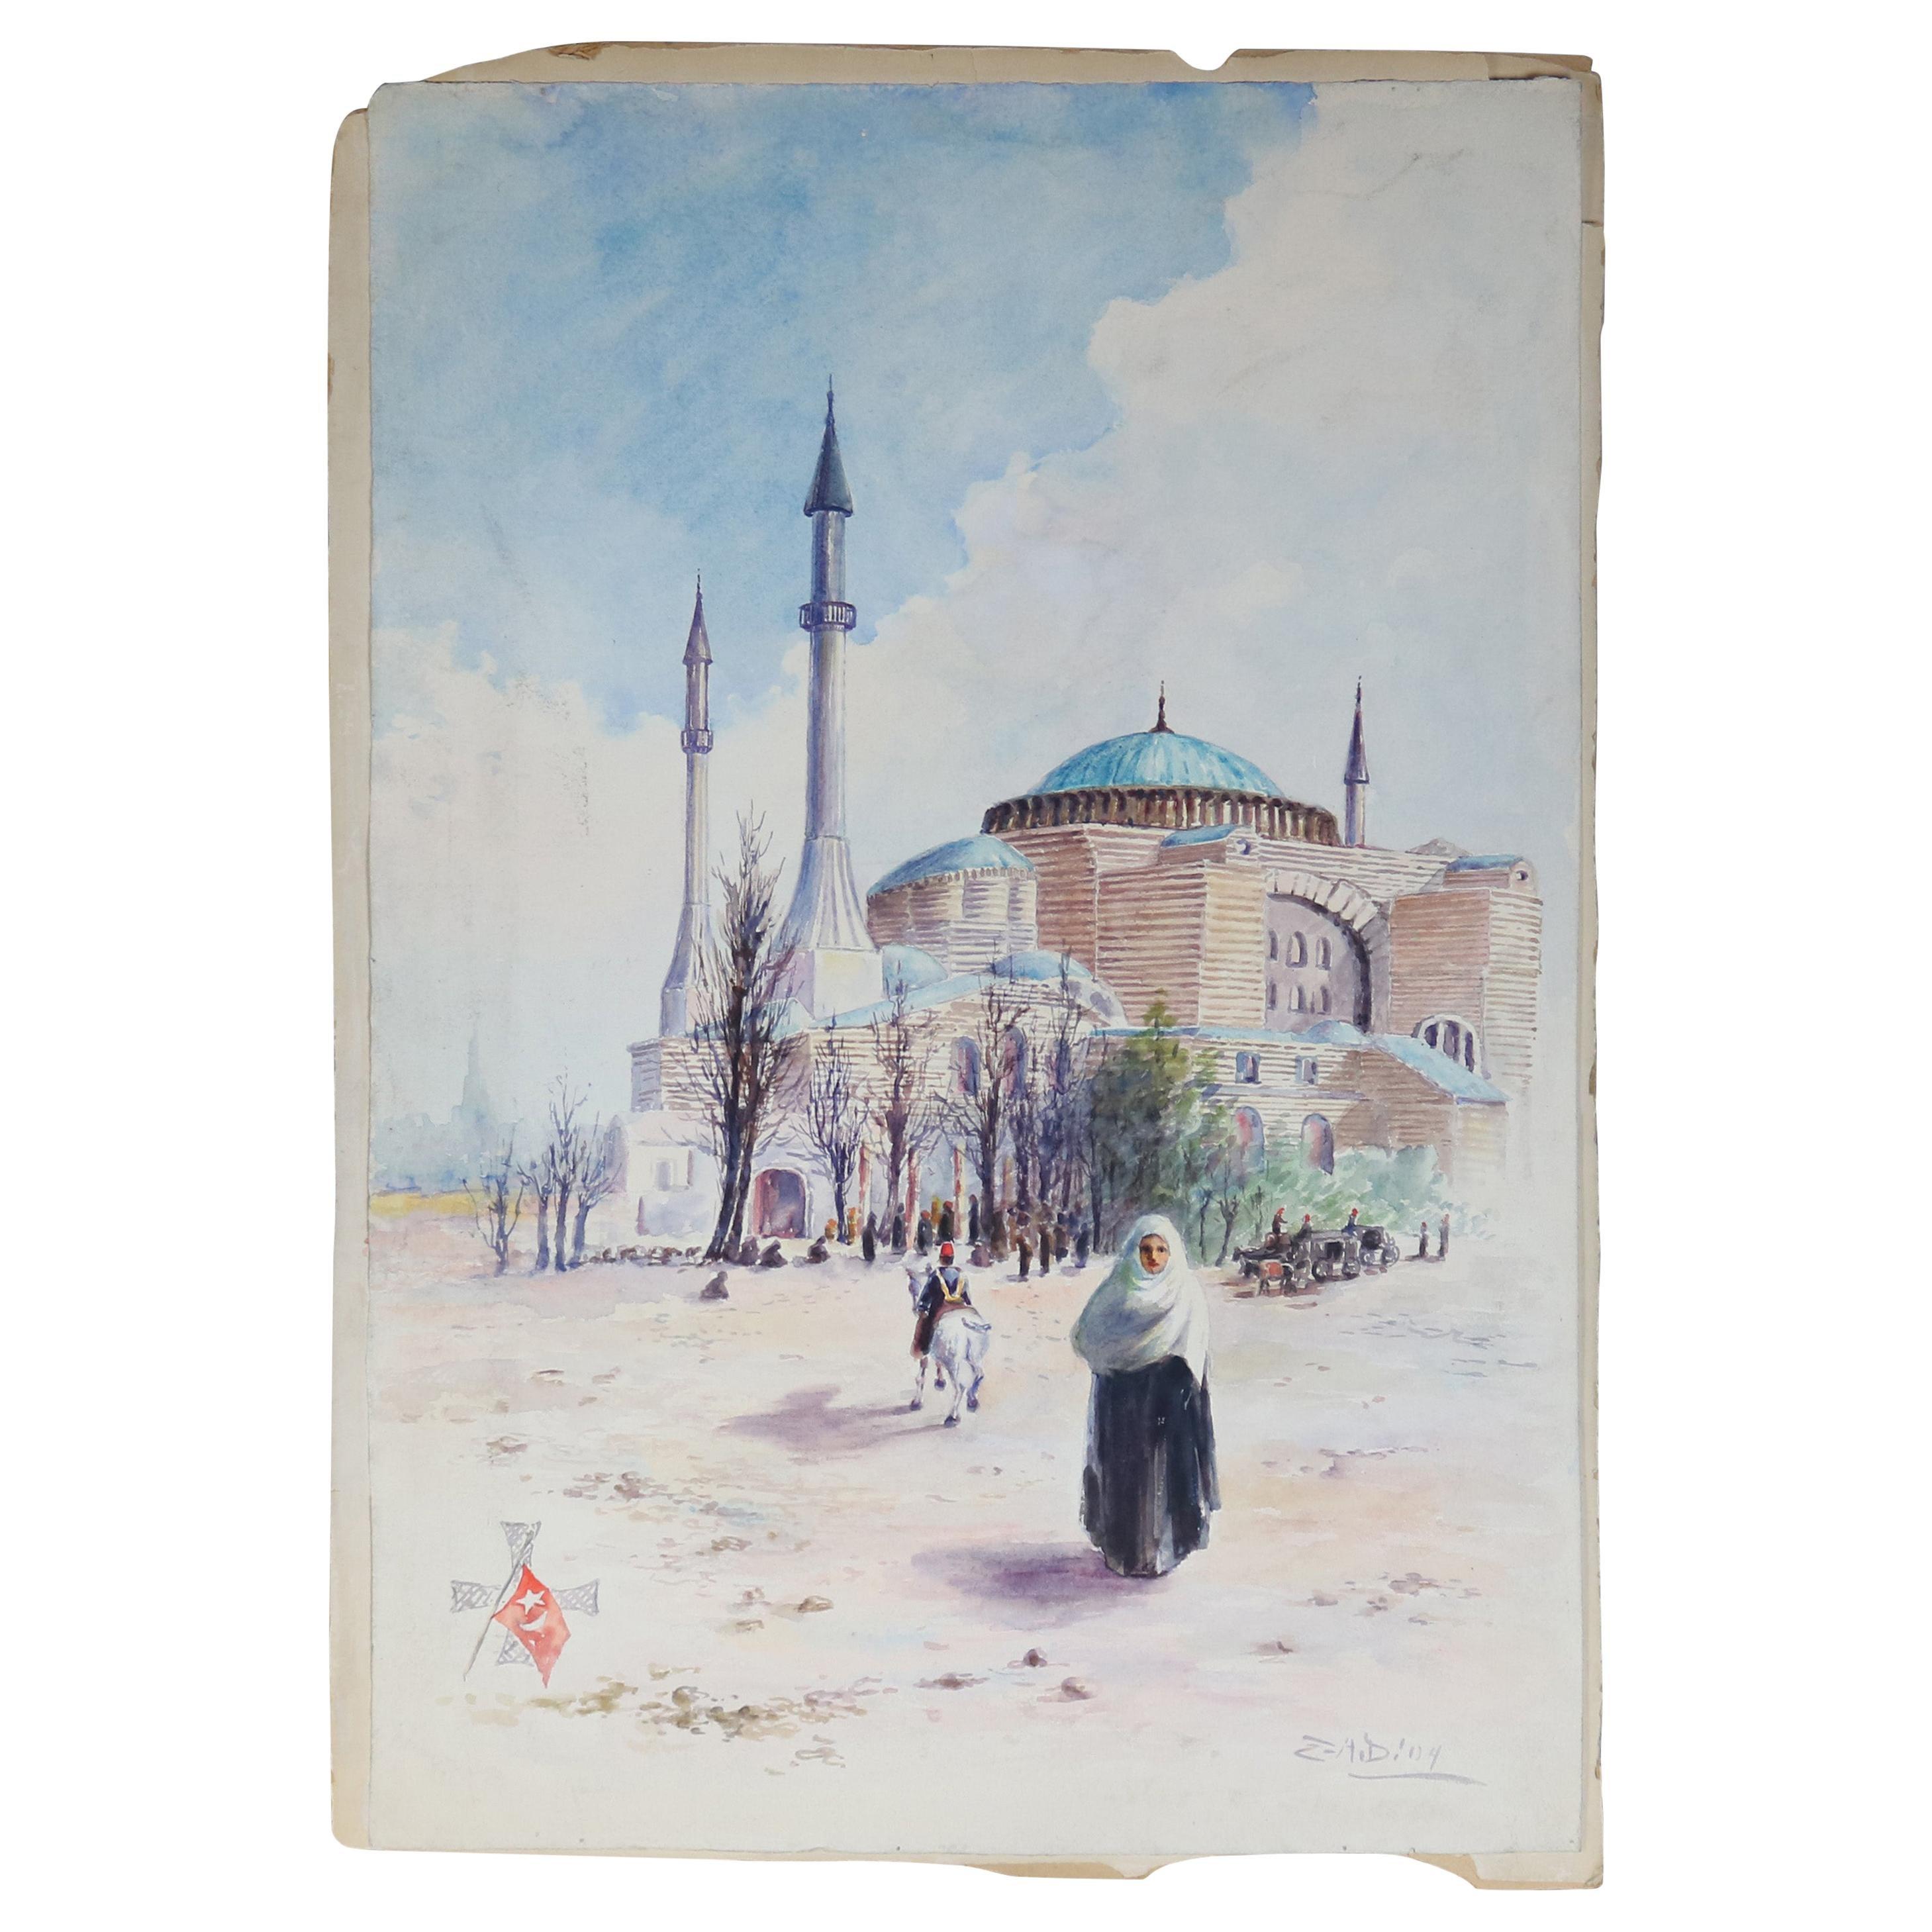 Antique Orientalist Moorish Watercolor on Paper, Signed, Circa 1900